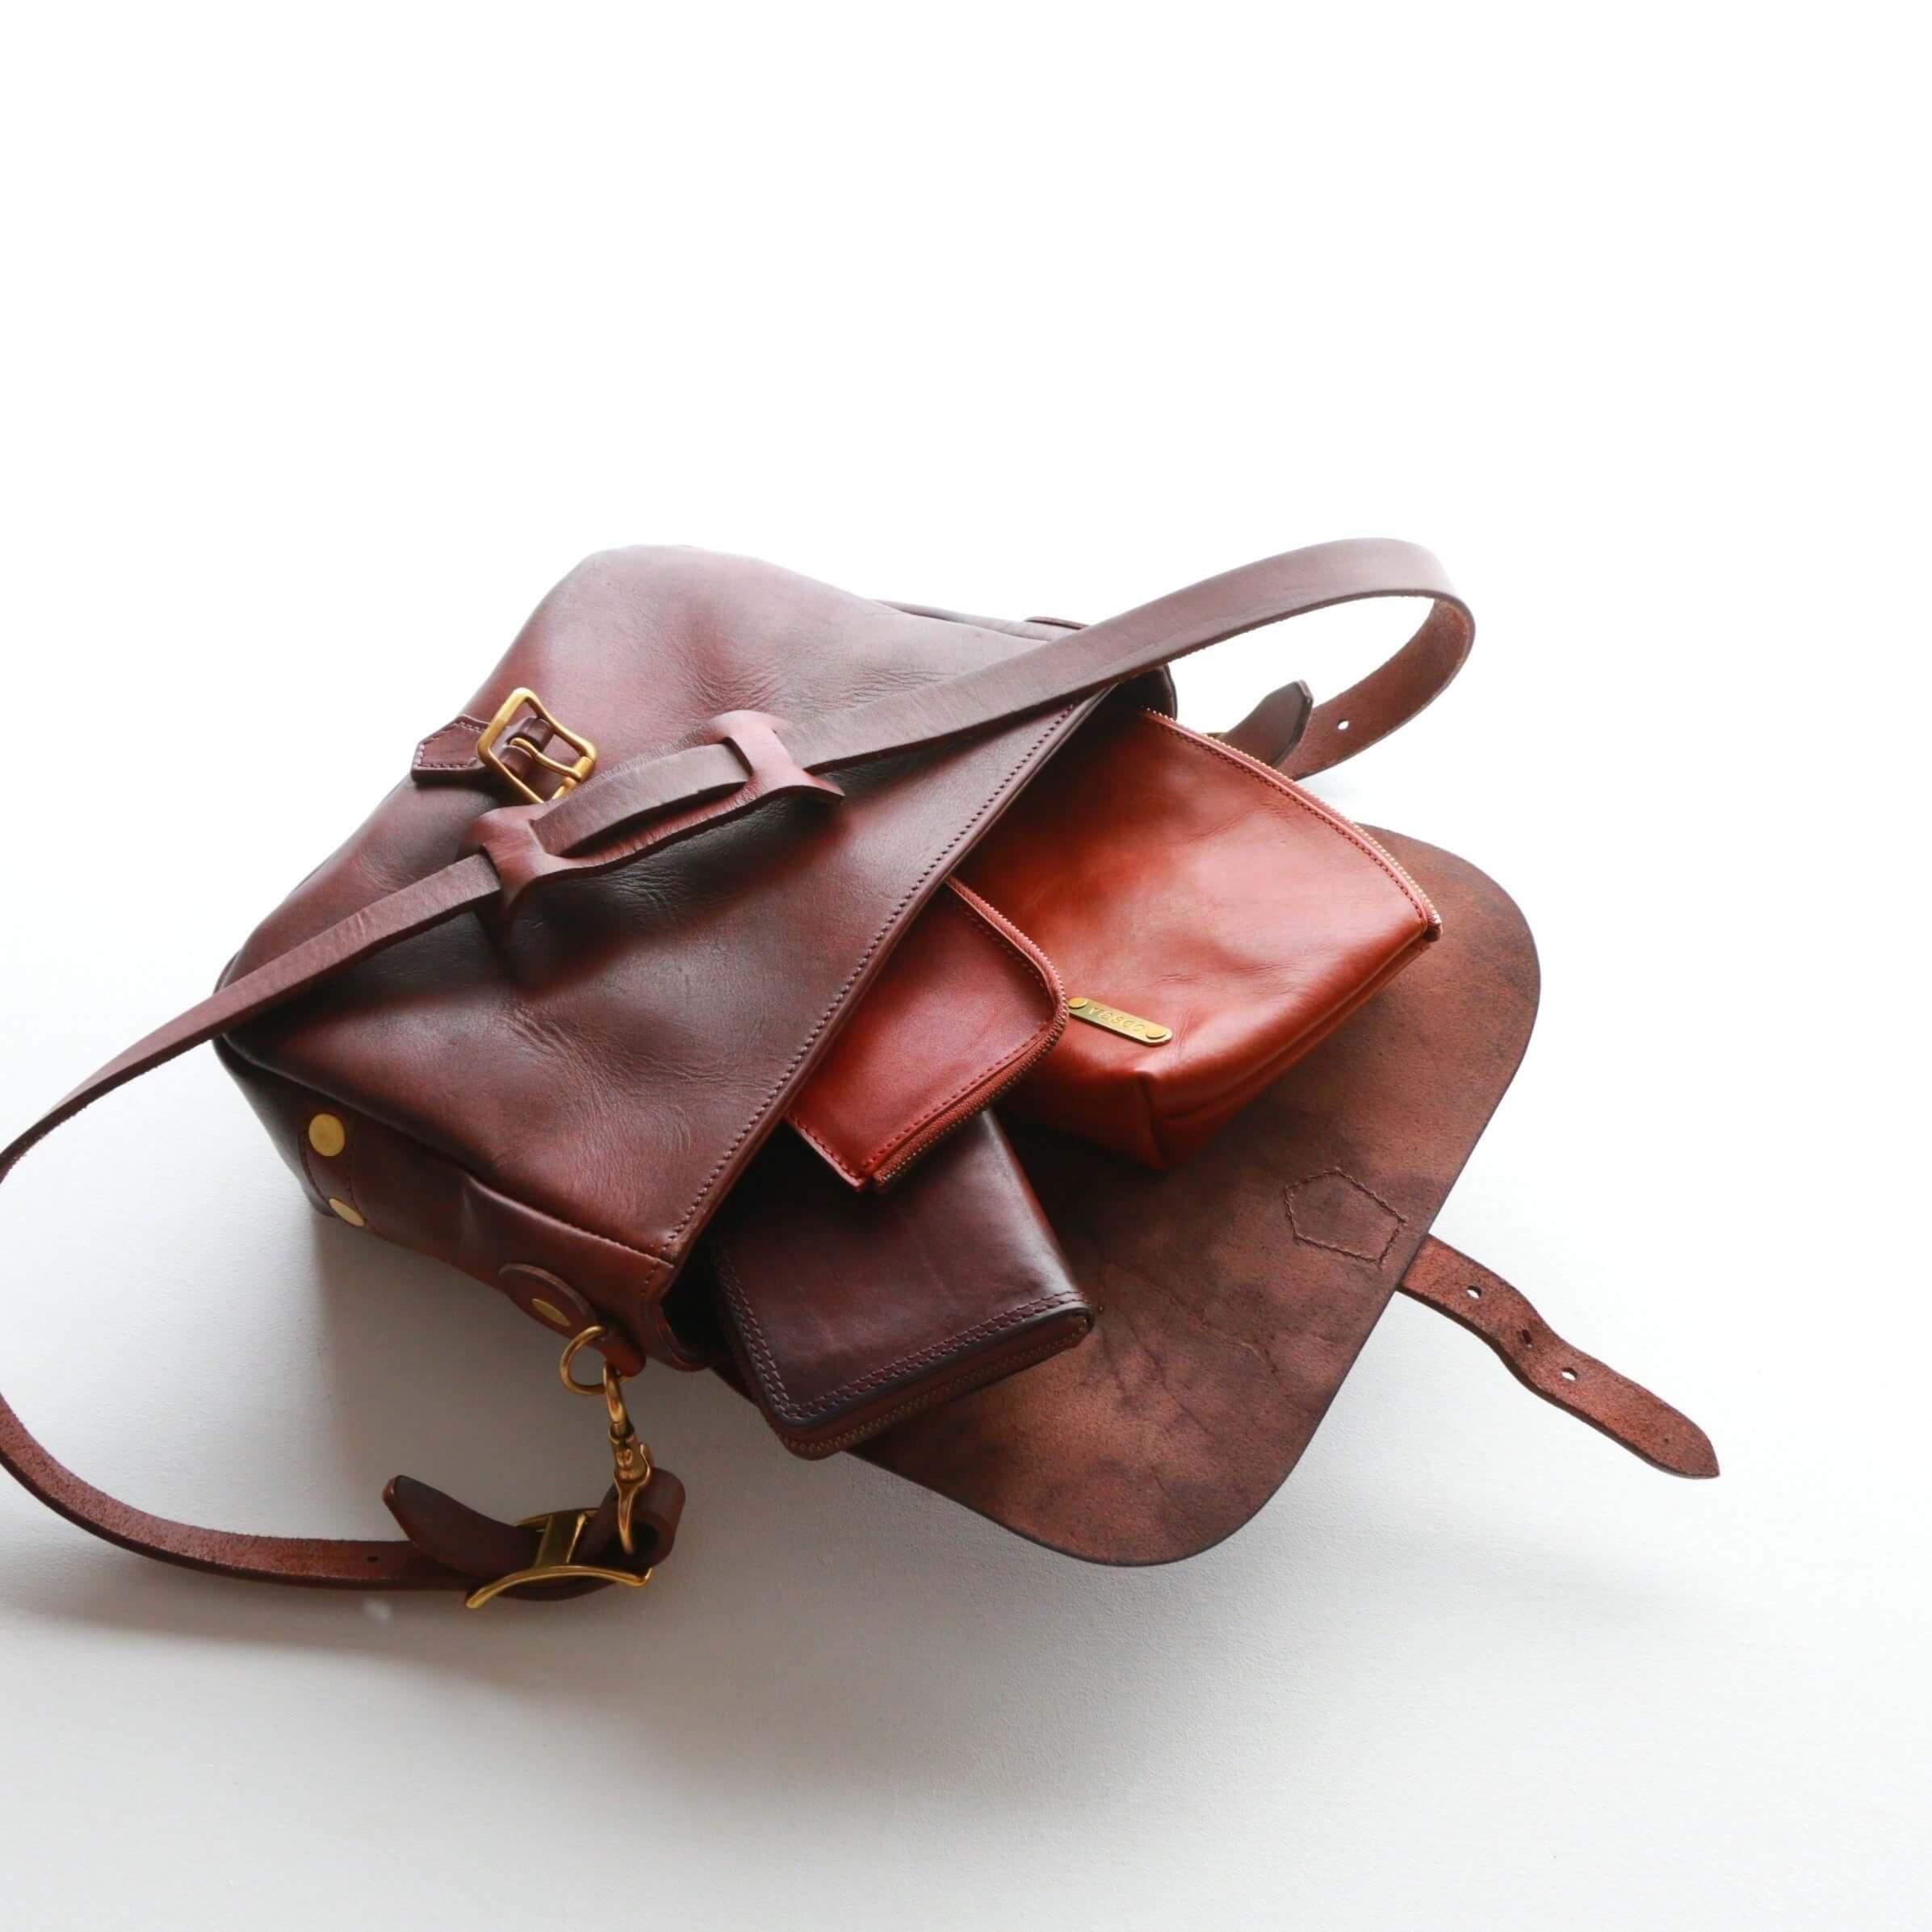 vasco ヴァスコ LEATHER POSTMAN SHOULDER BAG SMALL レザーポストマンショルダーバッグ スモール 刻印アリ VS-249L